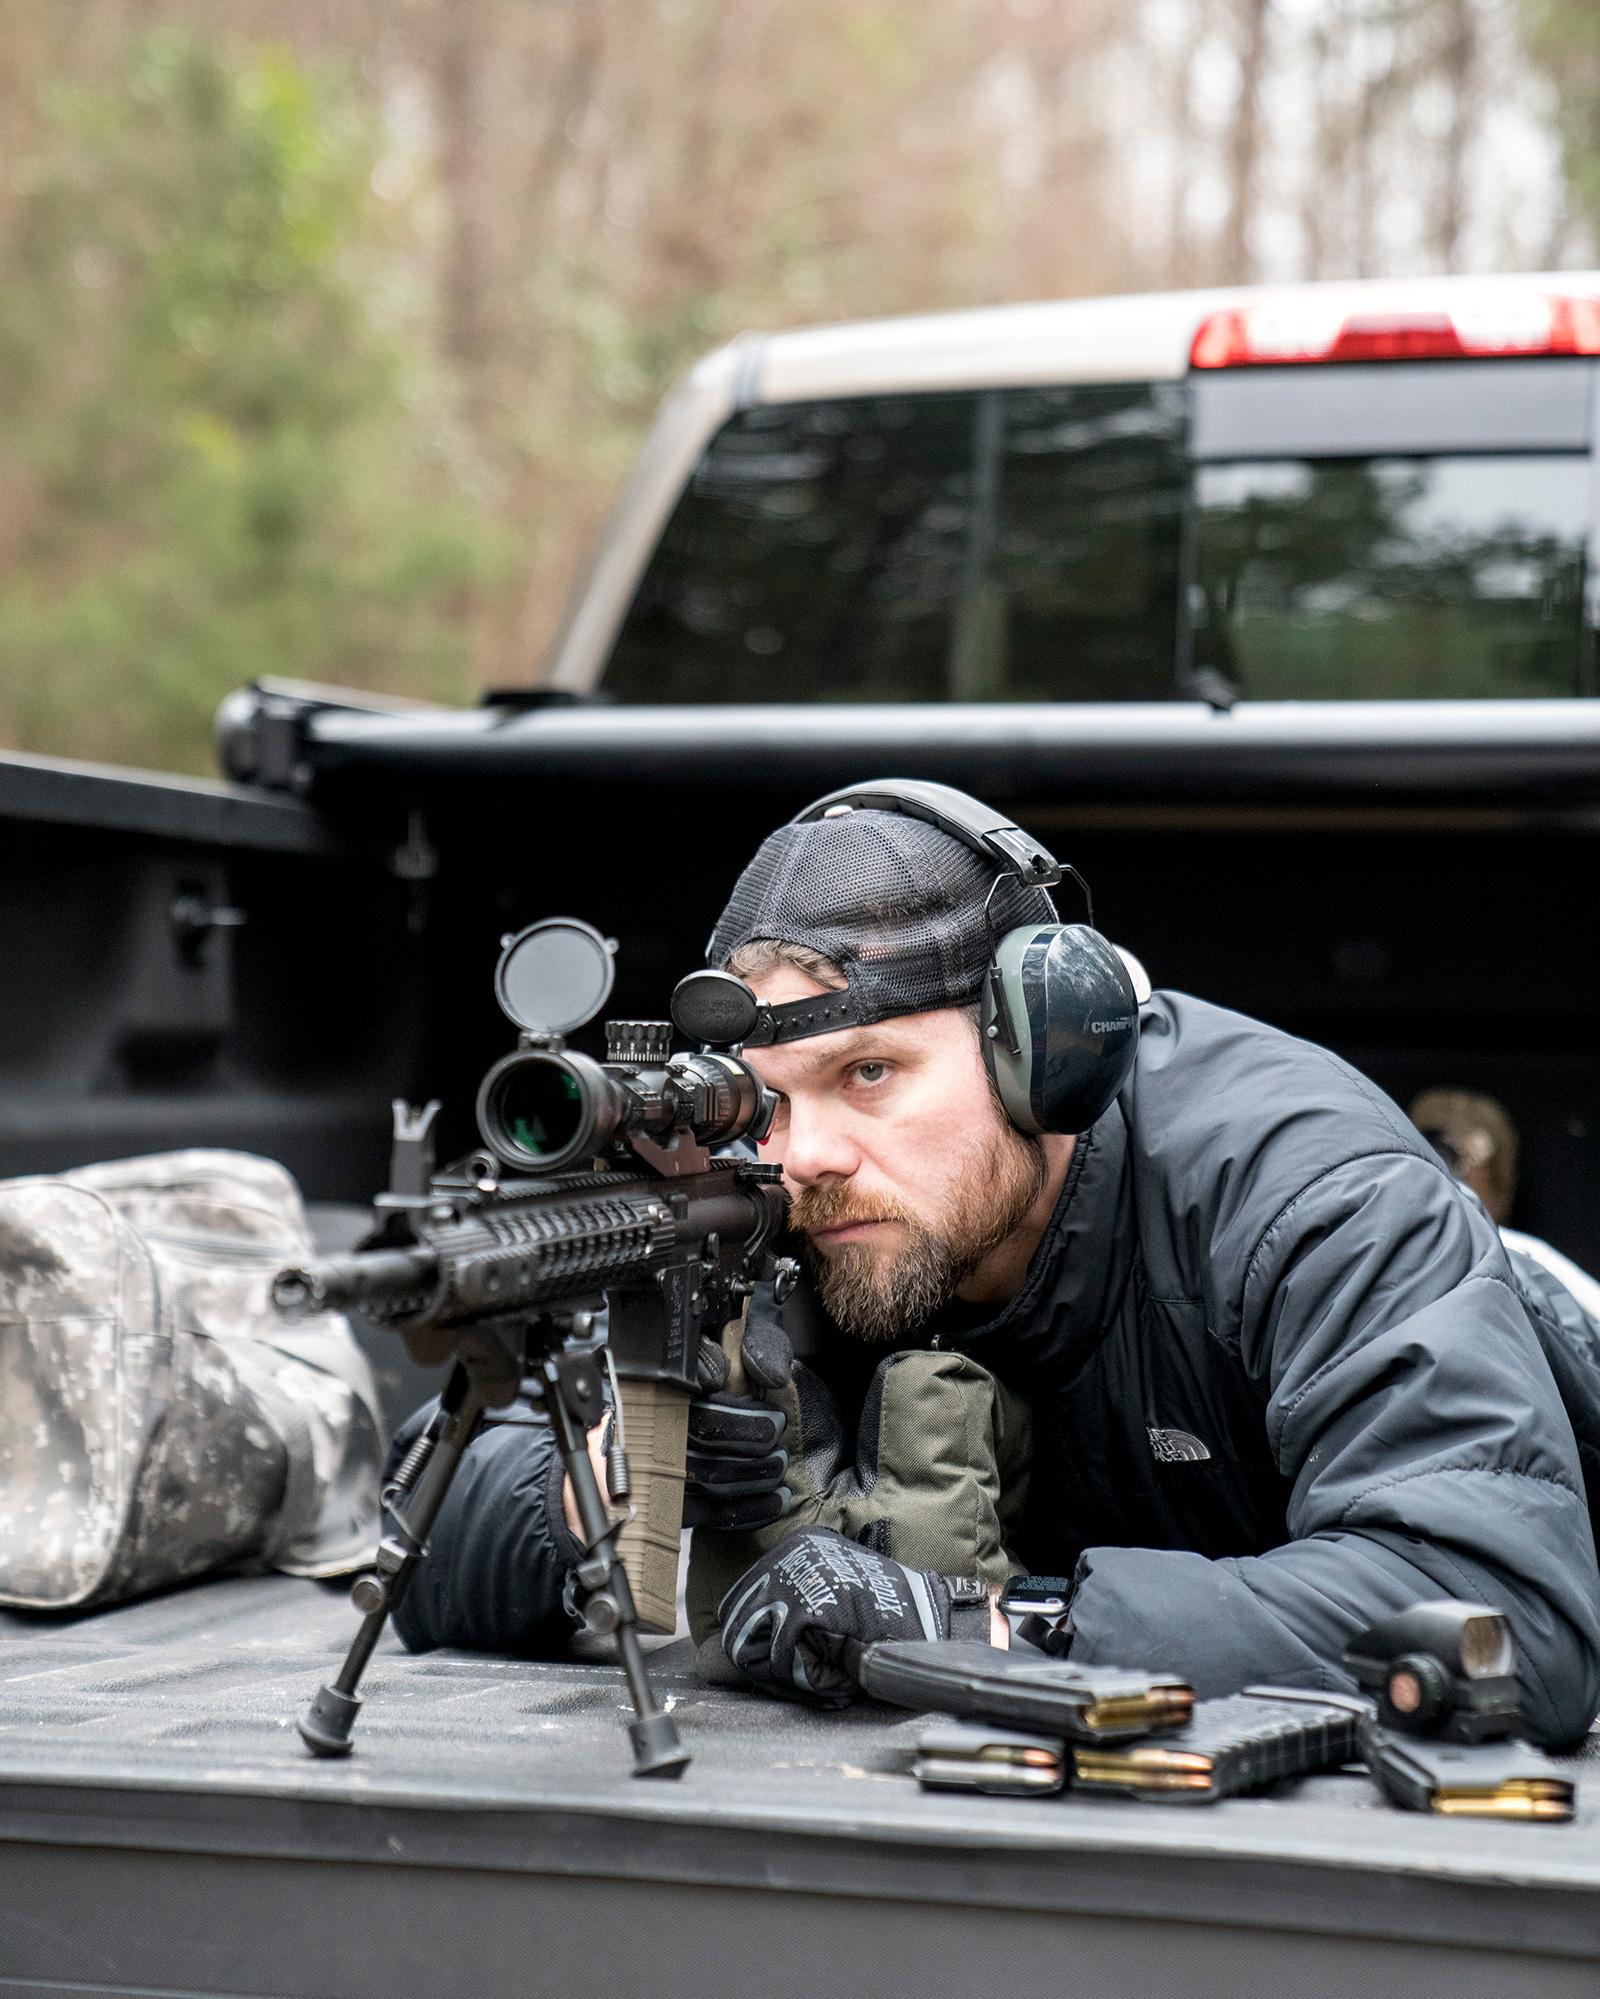 Phillip shooting AR-15